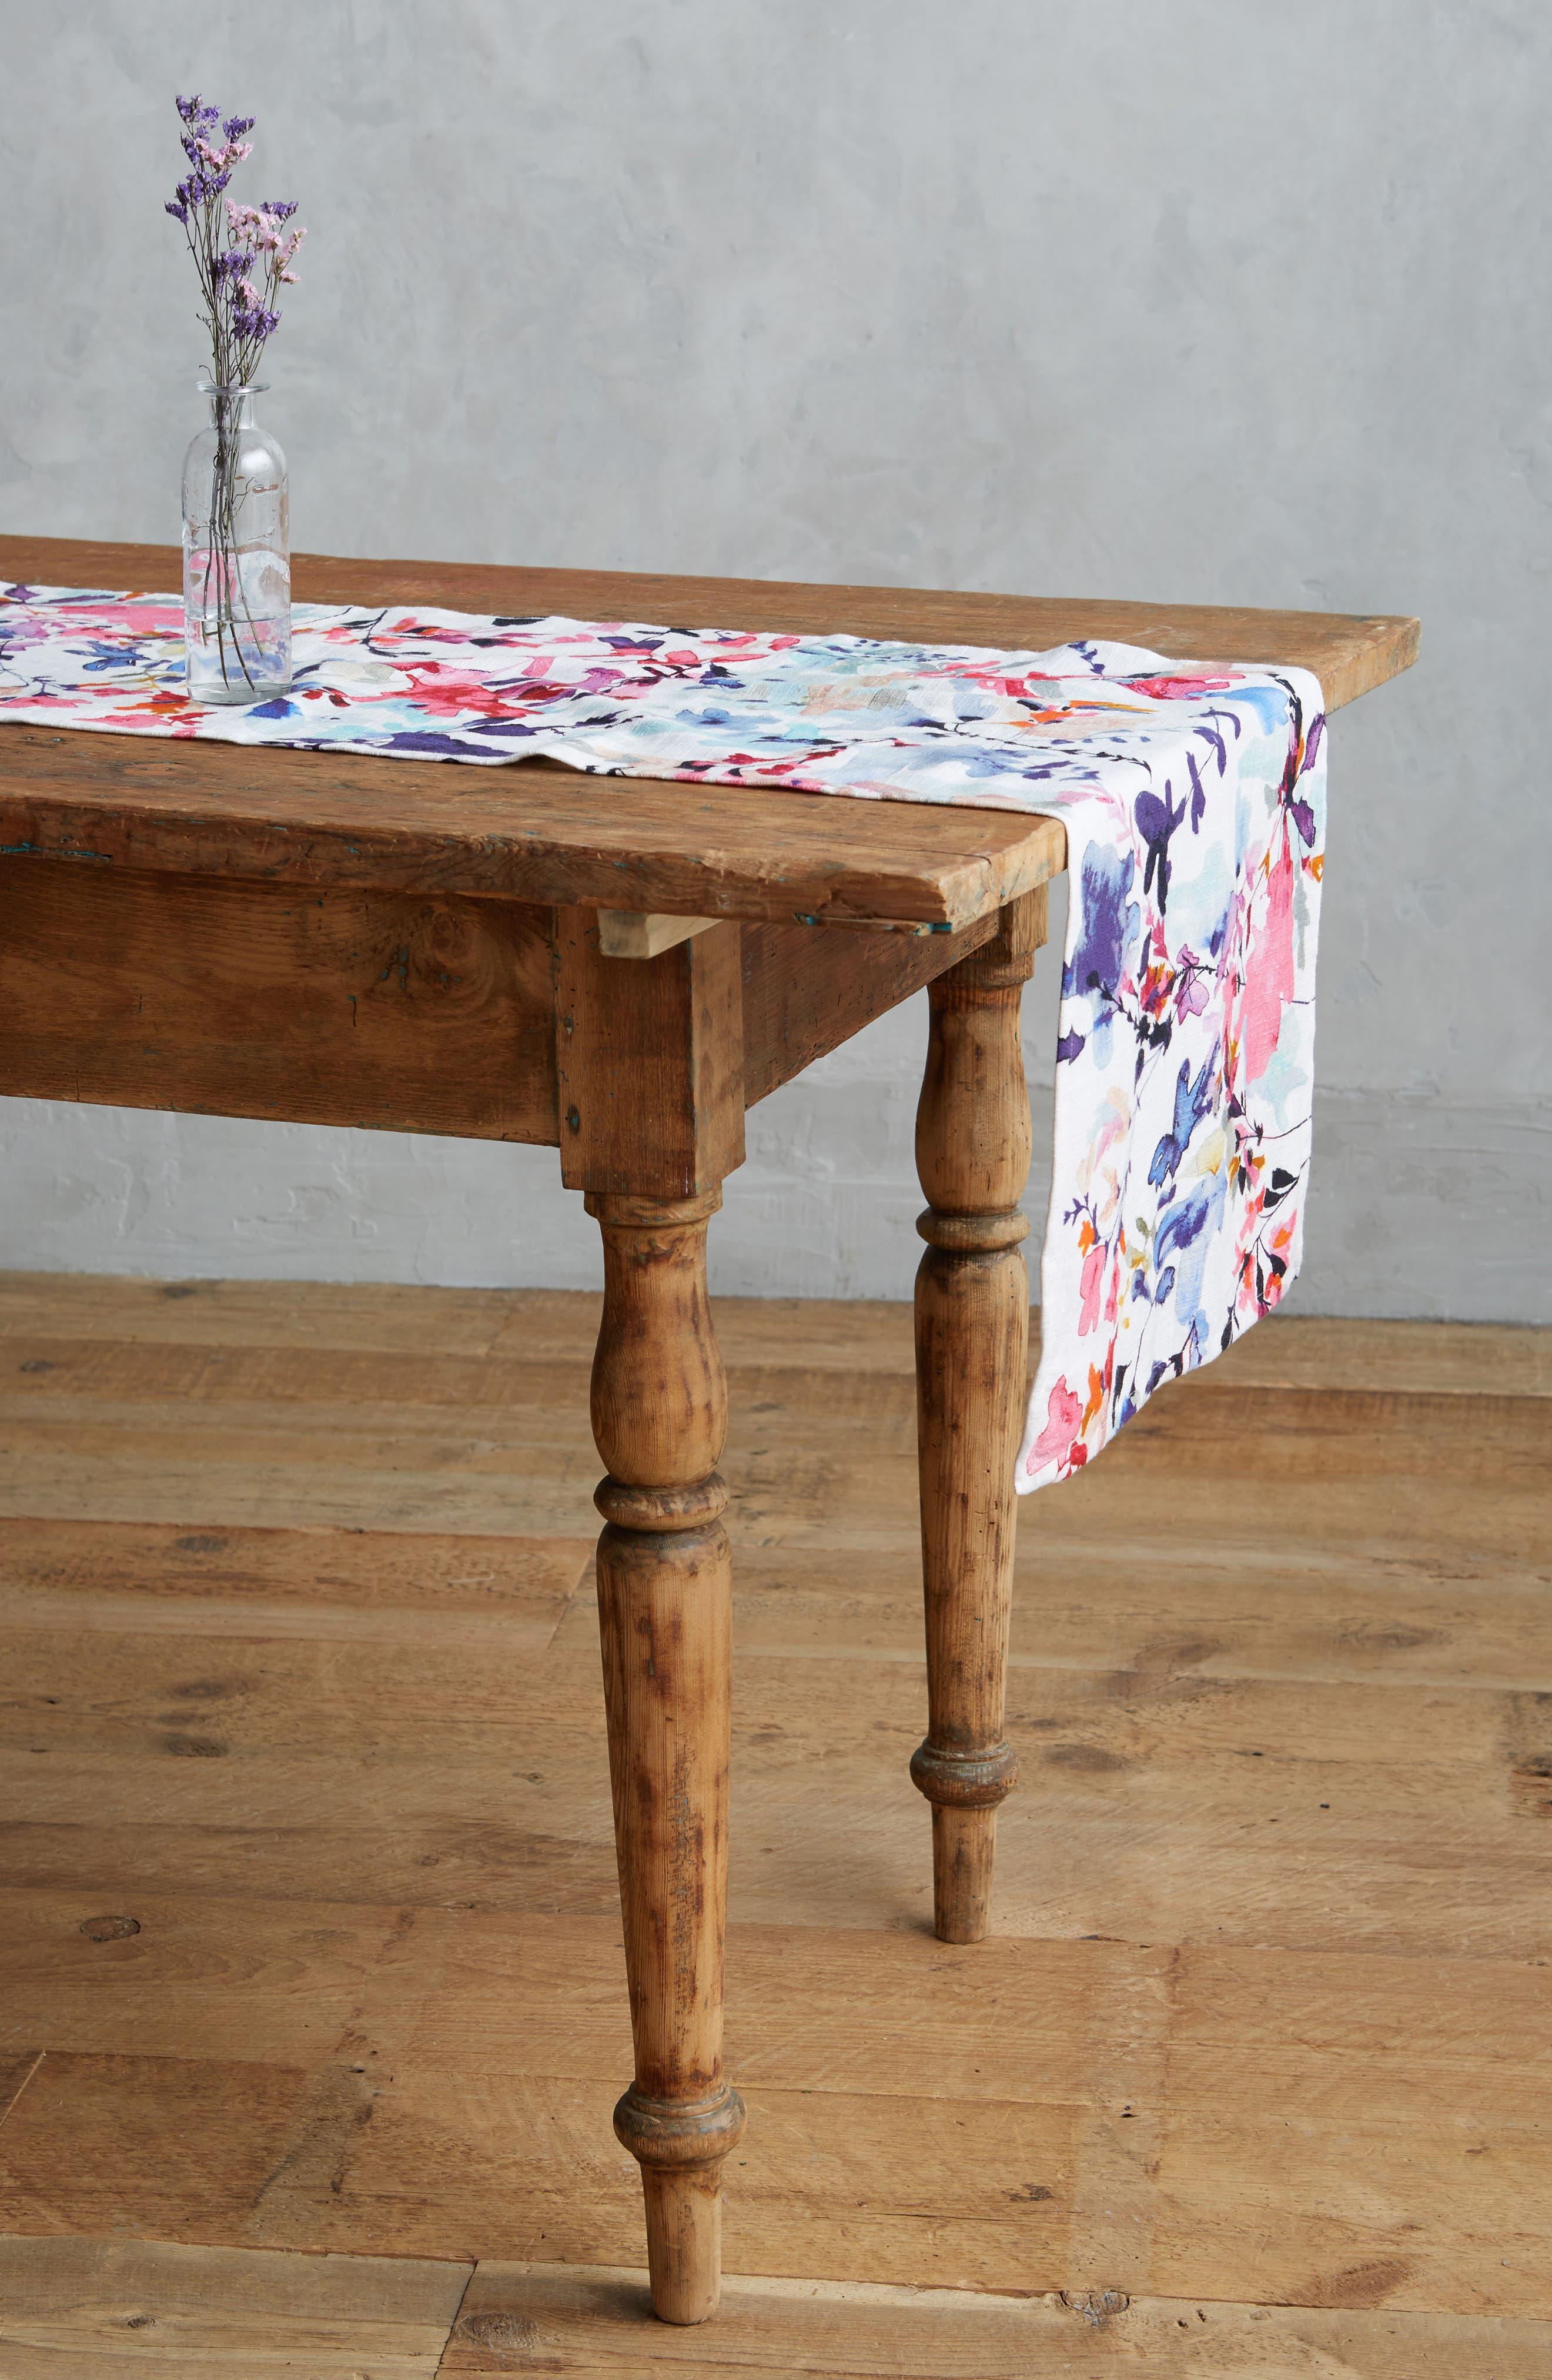 Main Image - Anthropologie Wildflower Study Table Runner